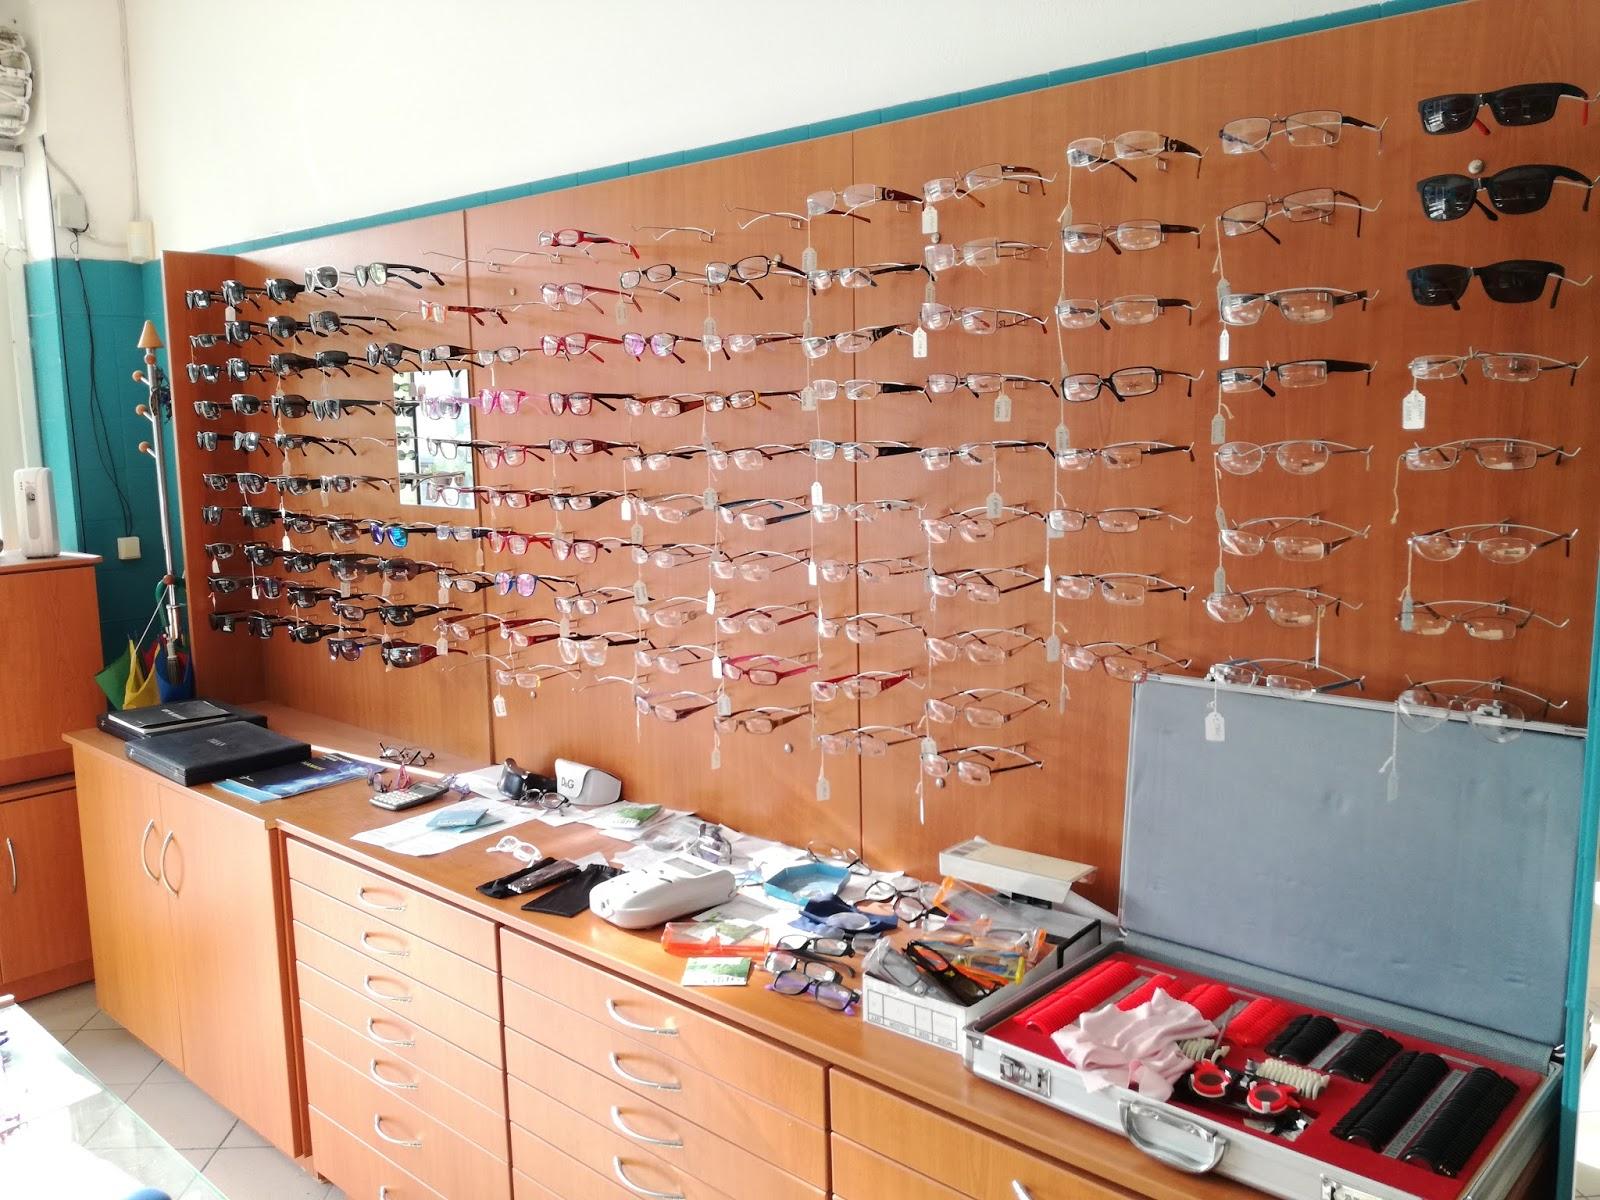 f9bdc38f0c Στο κατάστημα μπορείτε να βρείτε μεγάλη ποικιλία από γυαλιά ηλίου και  οράσεως. Επίσης διατίθενται και εφαρμόζονται φακοί επαφής για όλες τις  διορθώσεις και ...